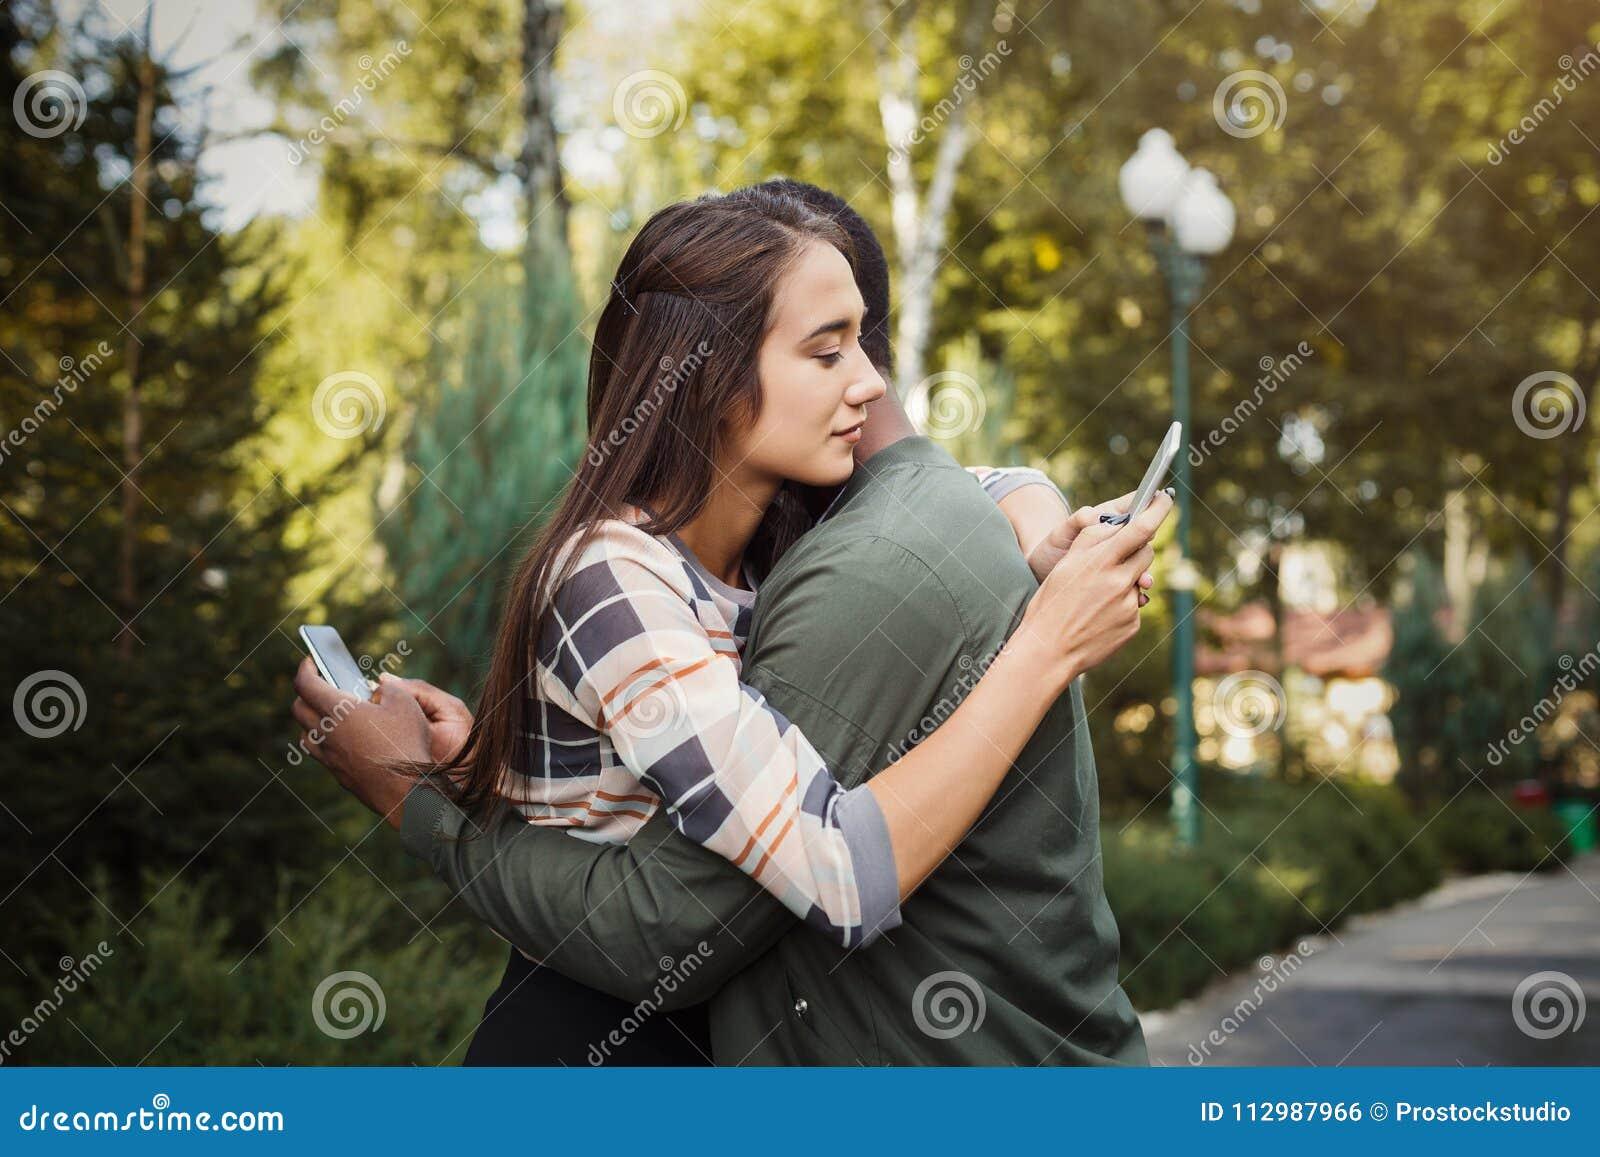 Relationship communication problem